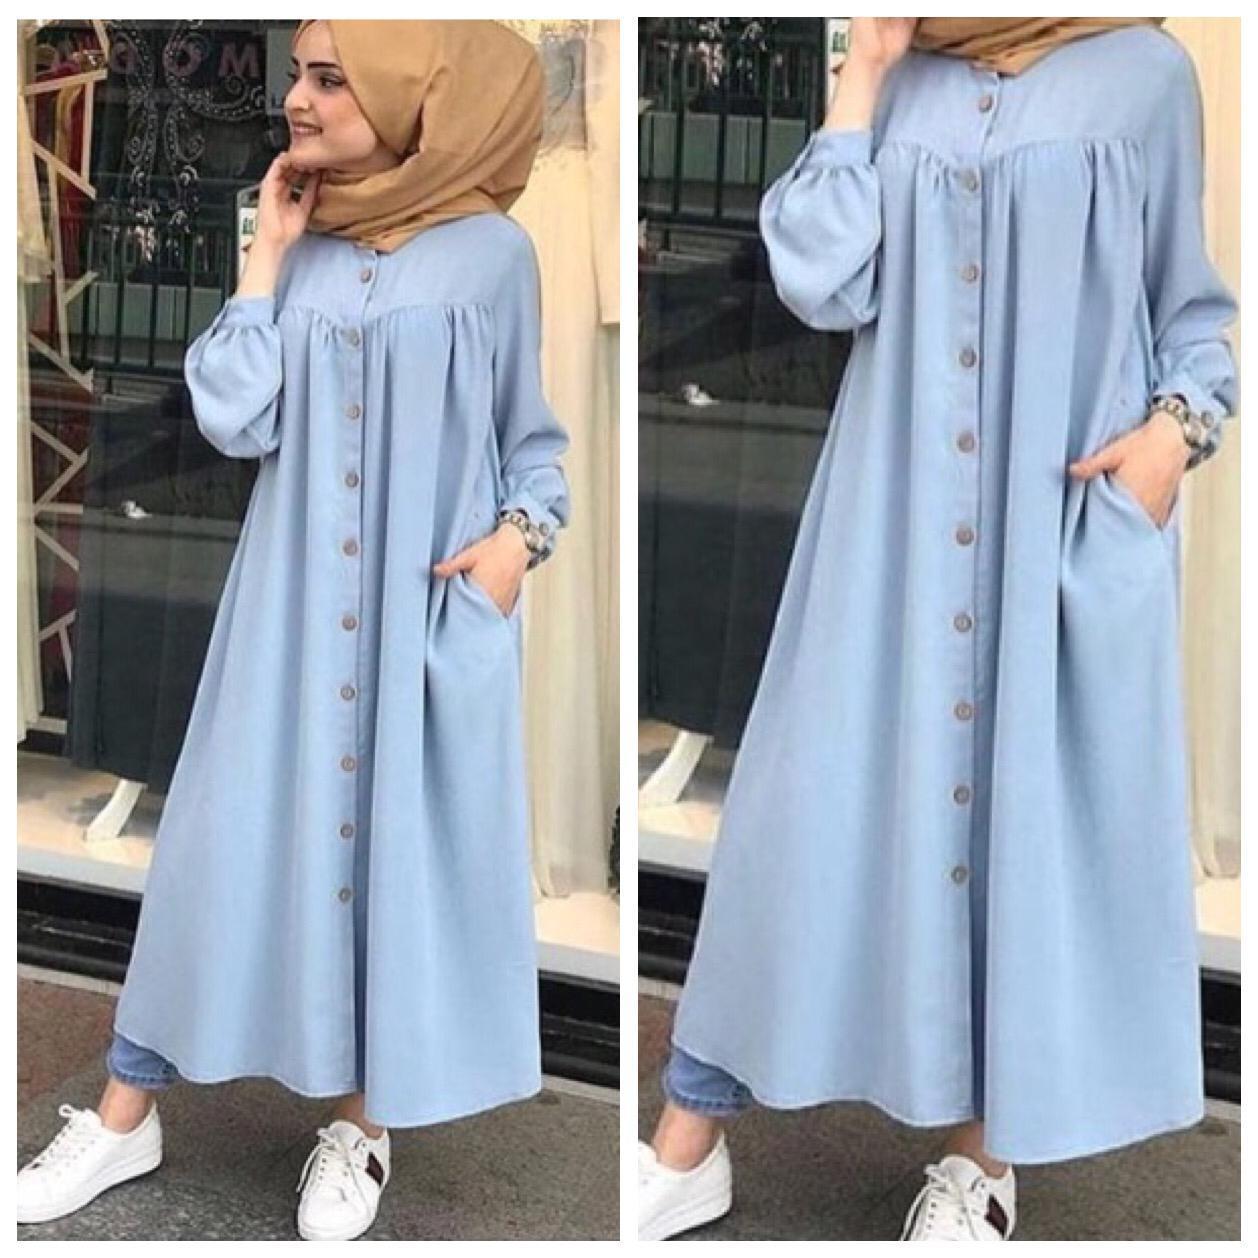 Damai Fashion Jakarta Baju Long Dress Muslim Gamis Wanita Kanaya Konveksi Murah